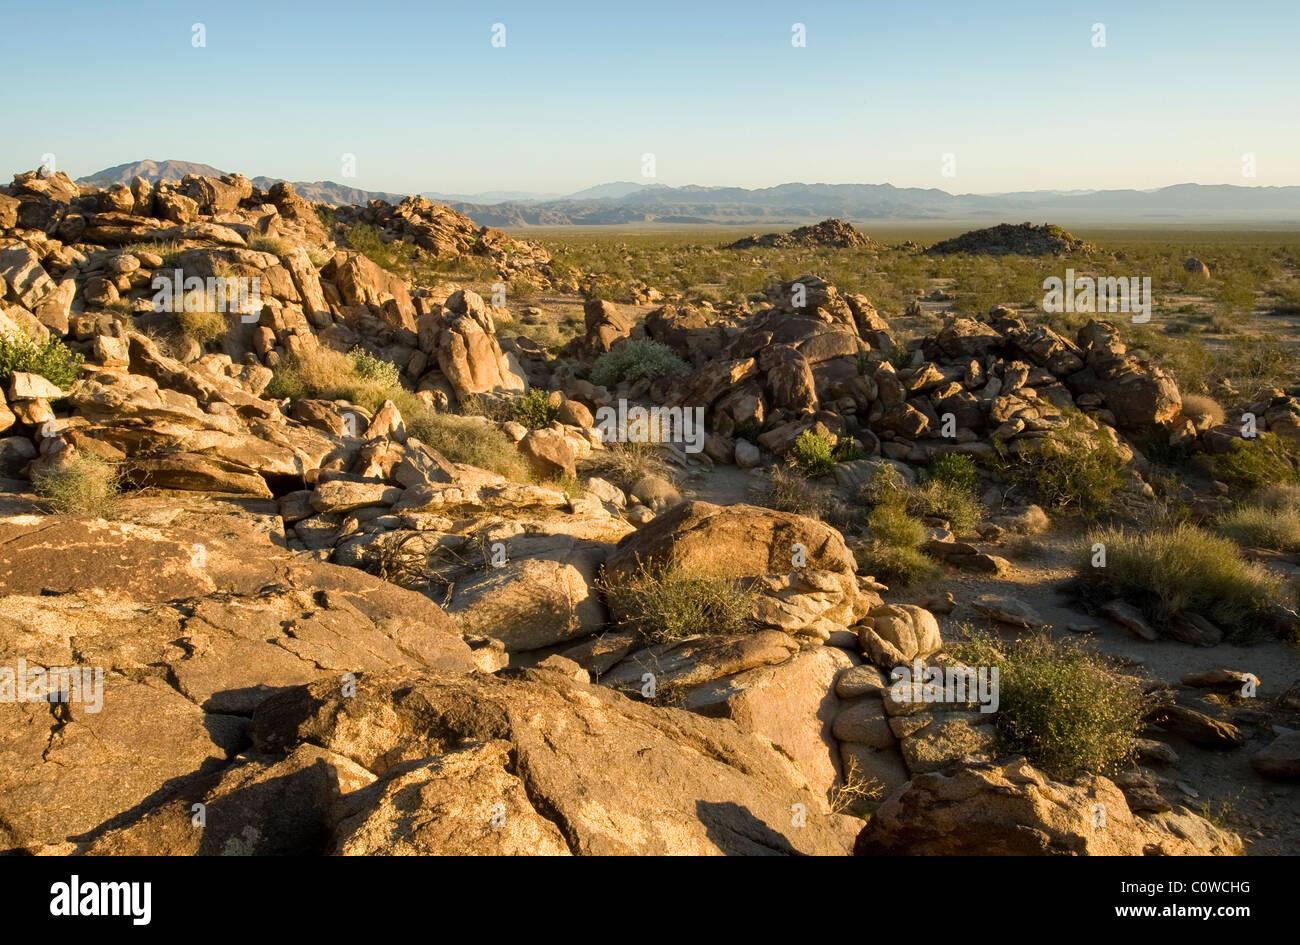 Mojave Desert, California - Stock Image